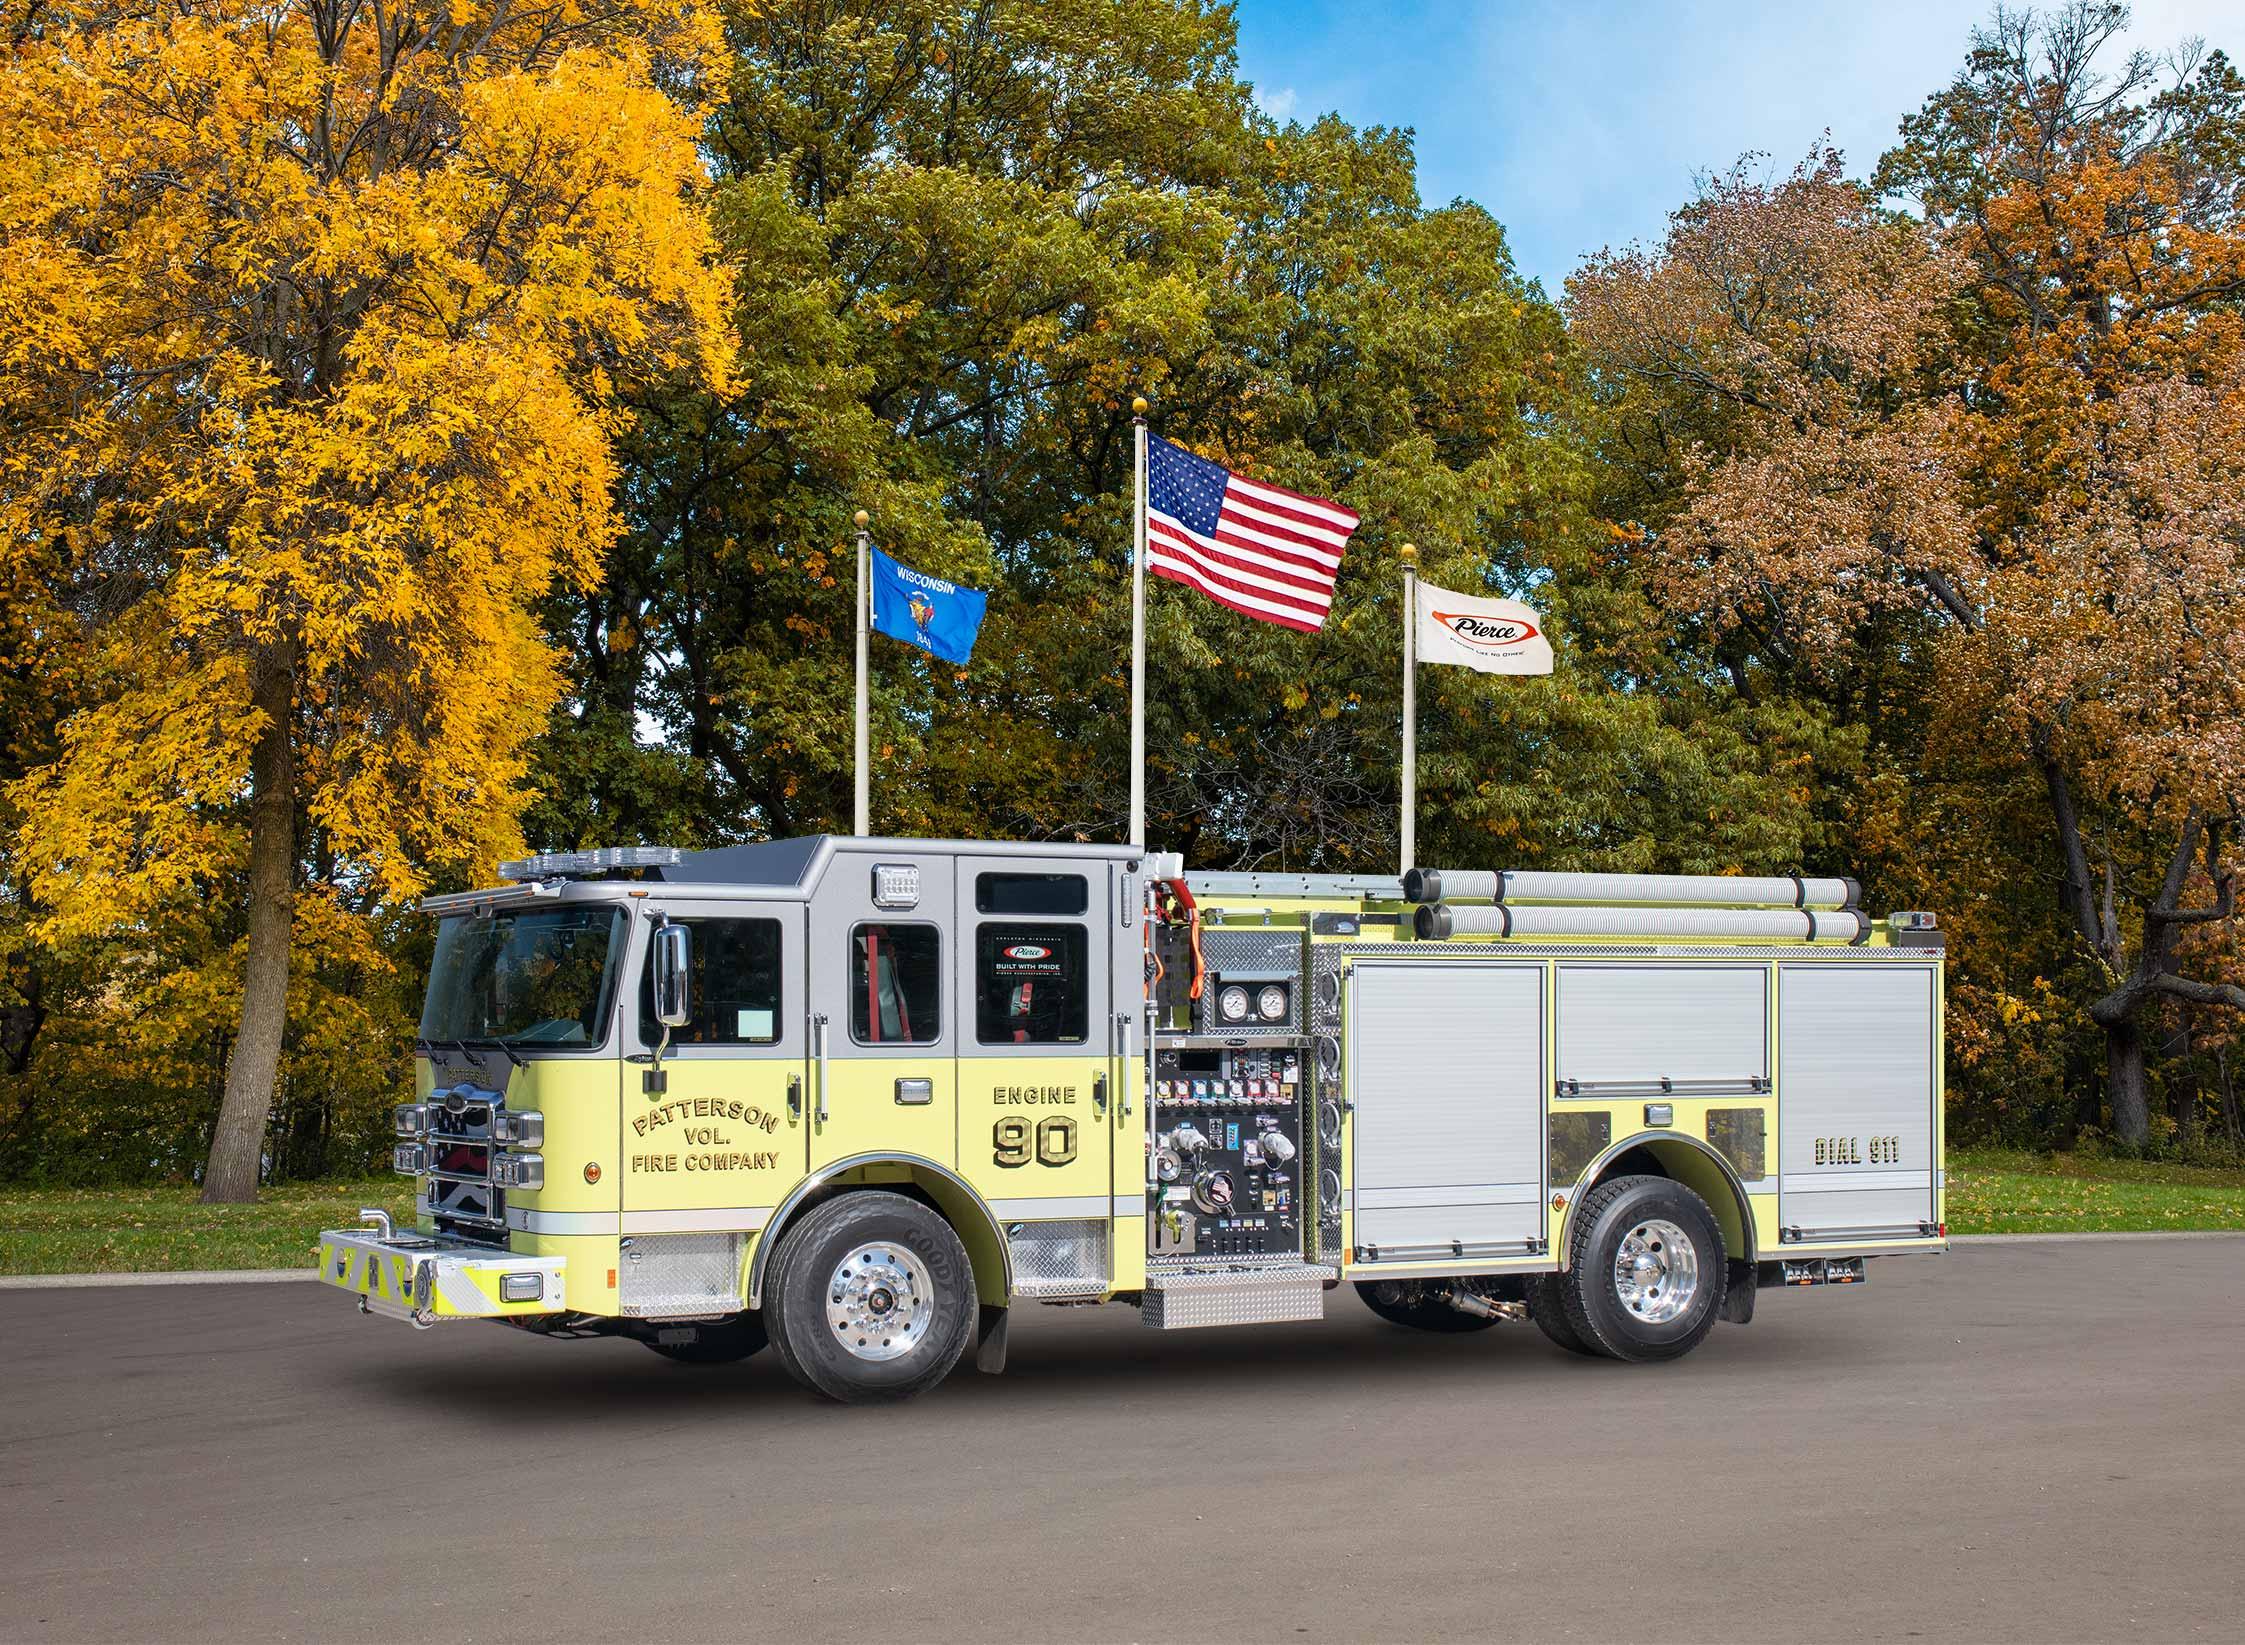 Patterson Township Volunteer Fire Department - Pumper